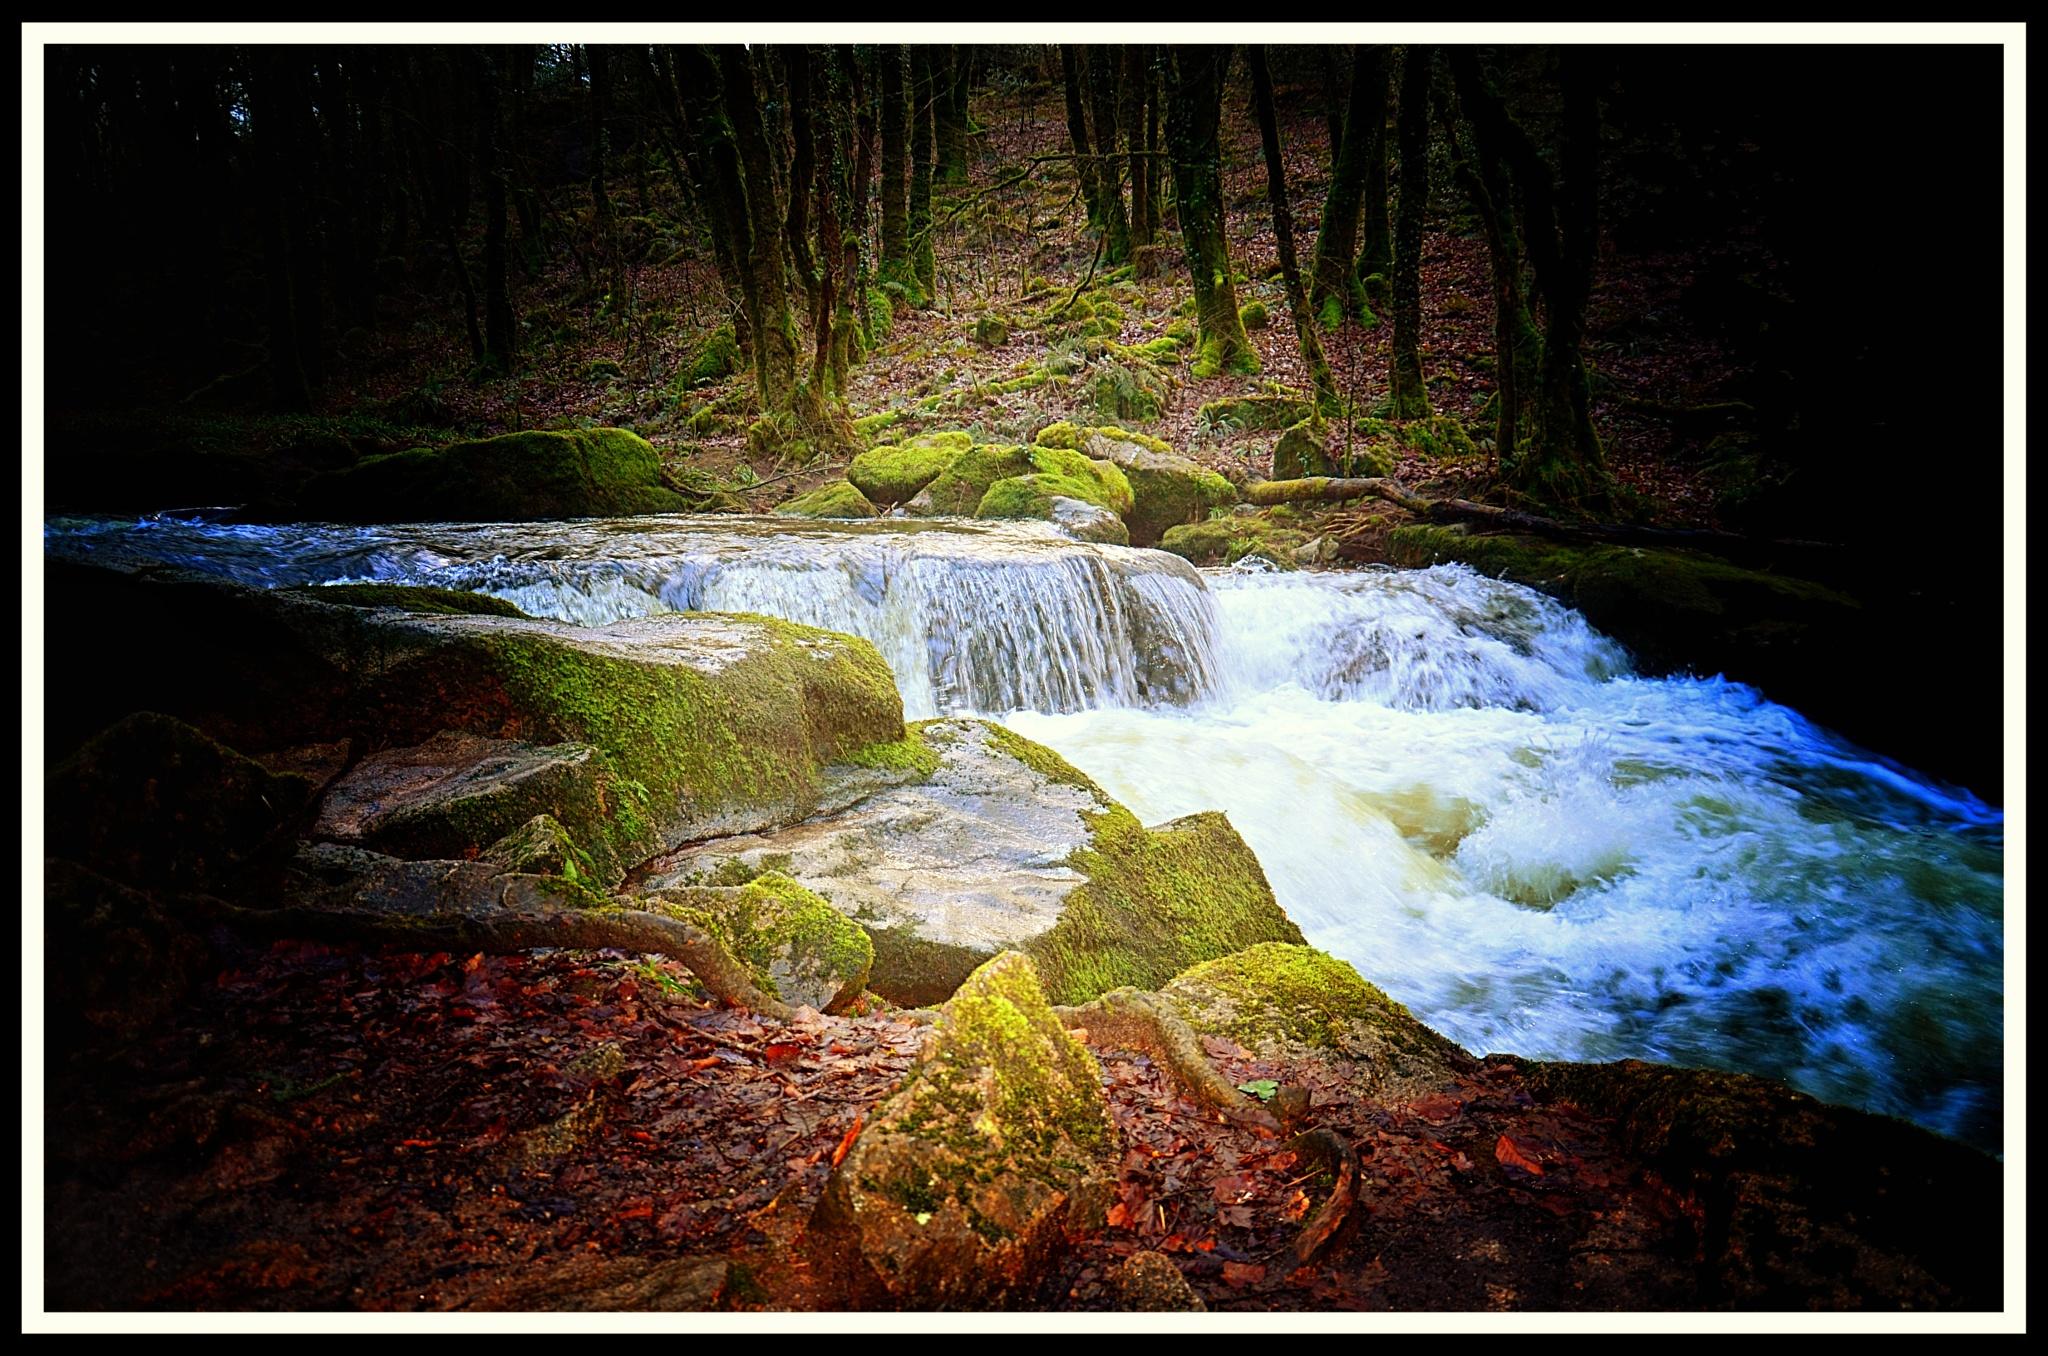 The River Fowey by johncedriccoles123